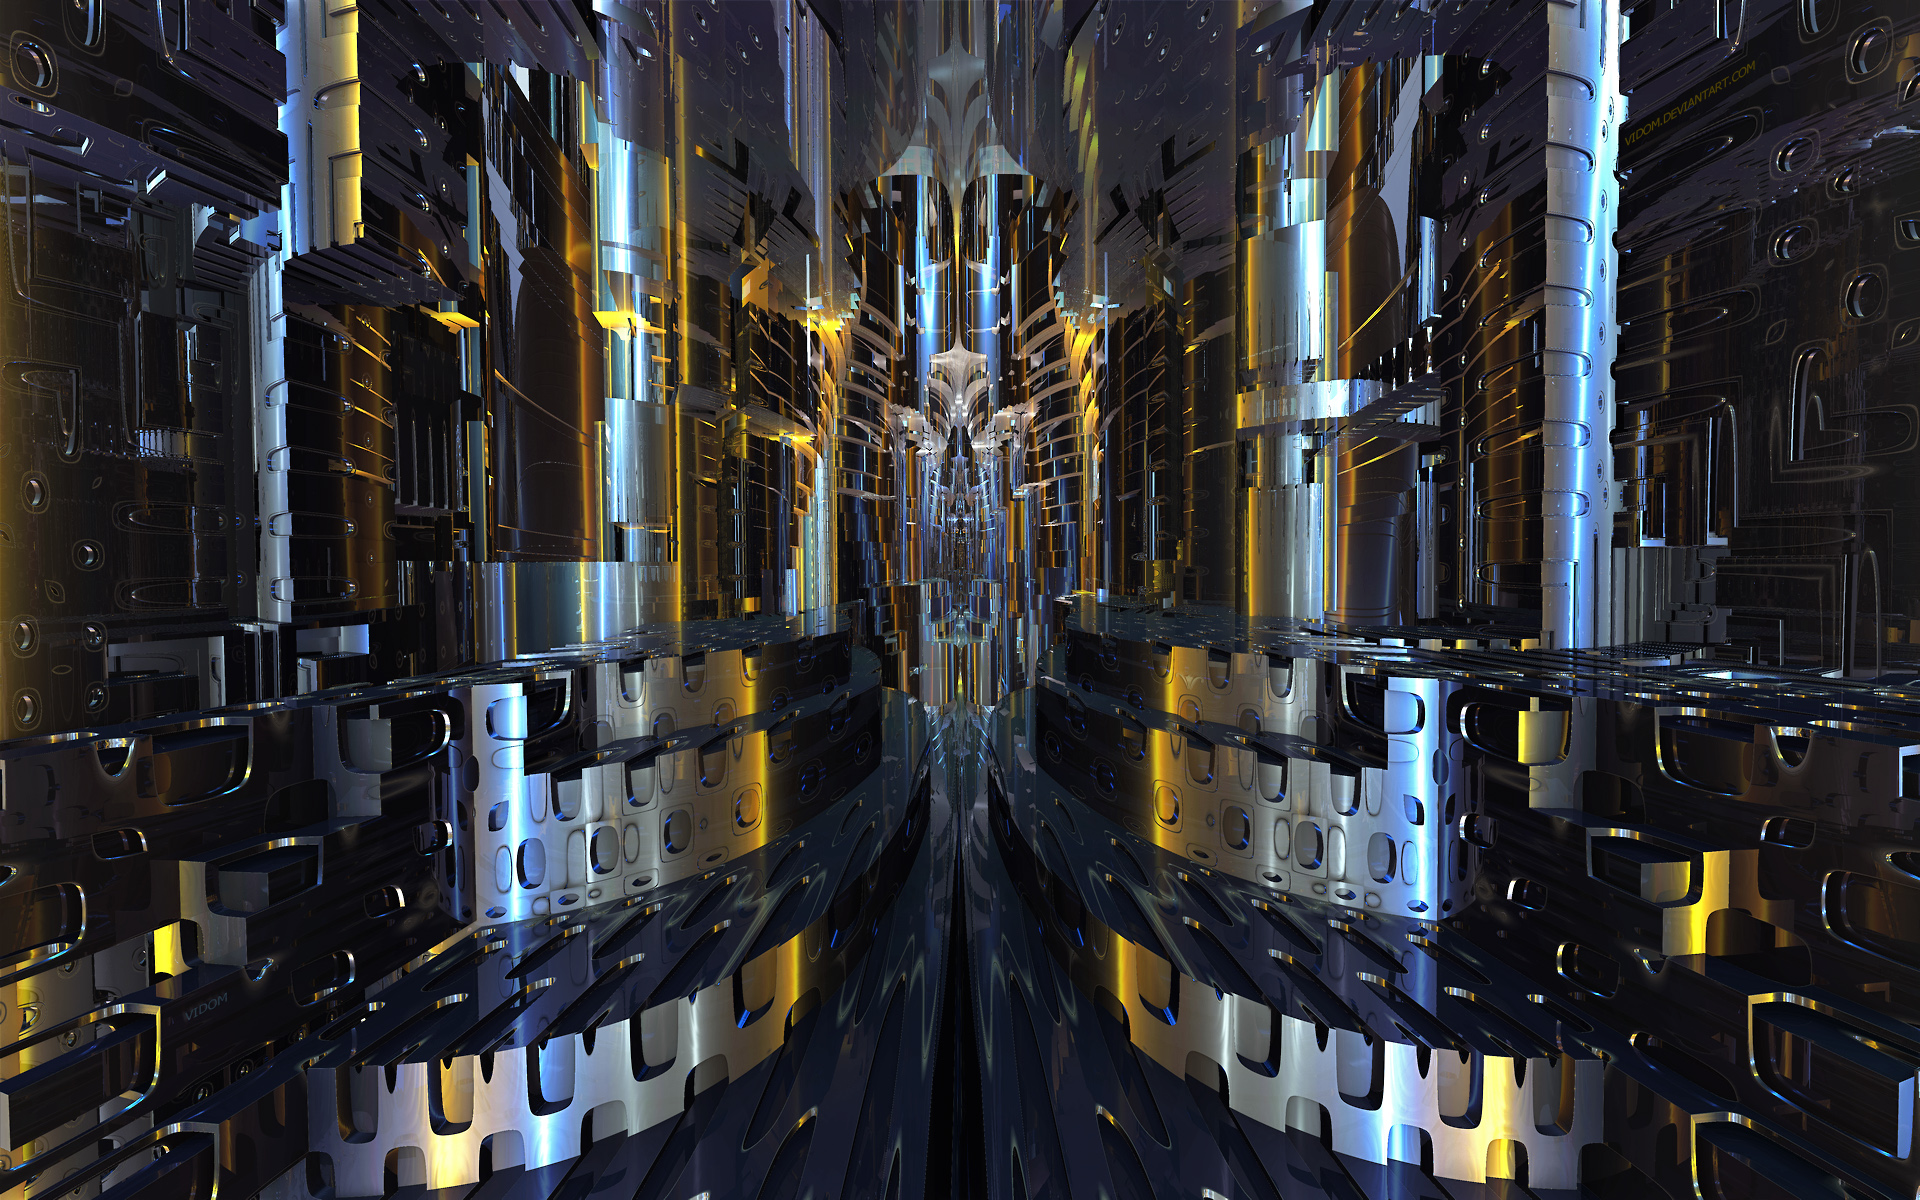 Alien ecclesiolatry by Vidom